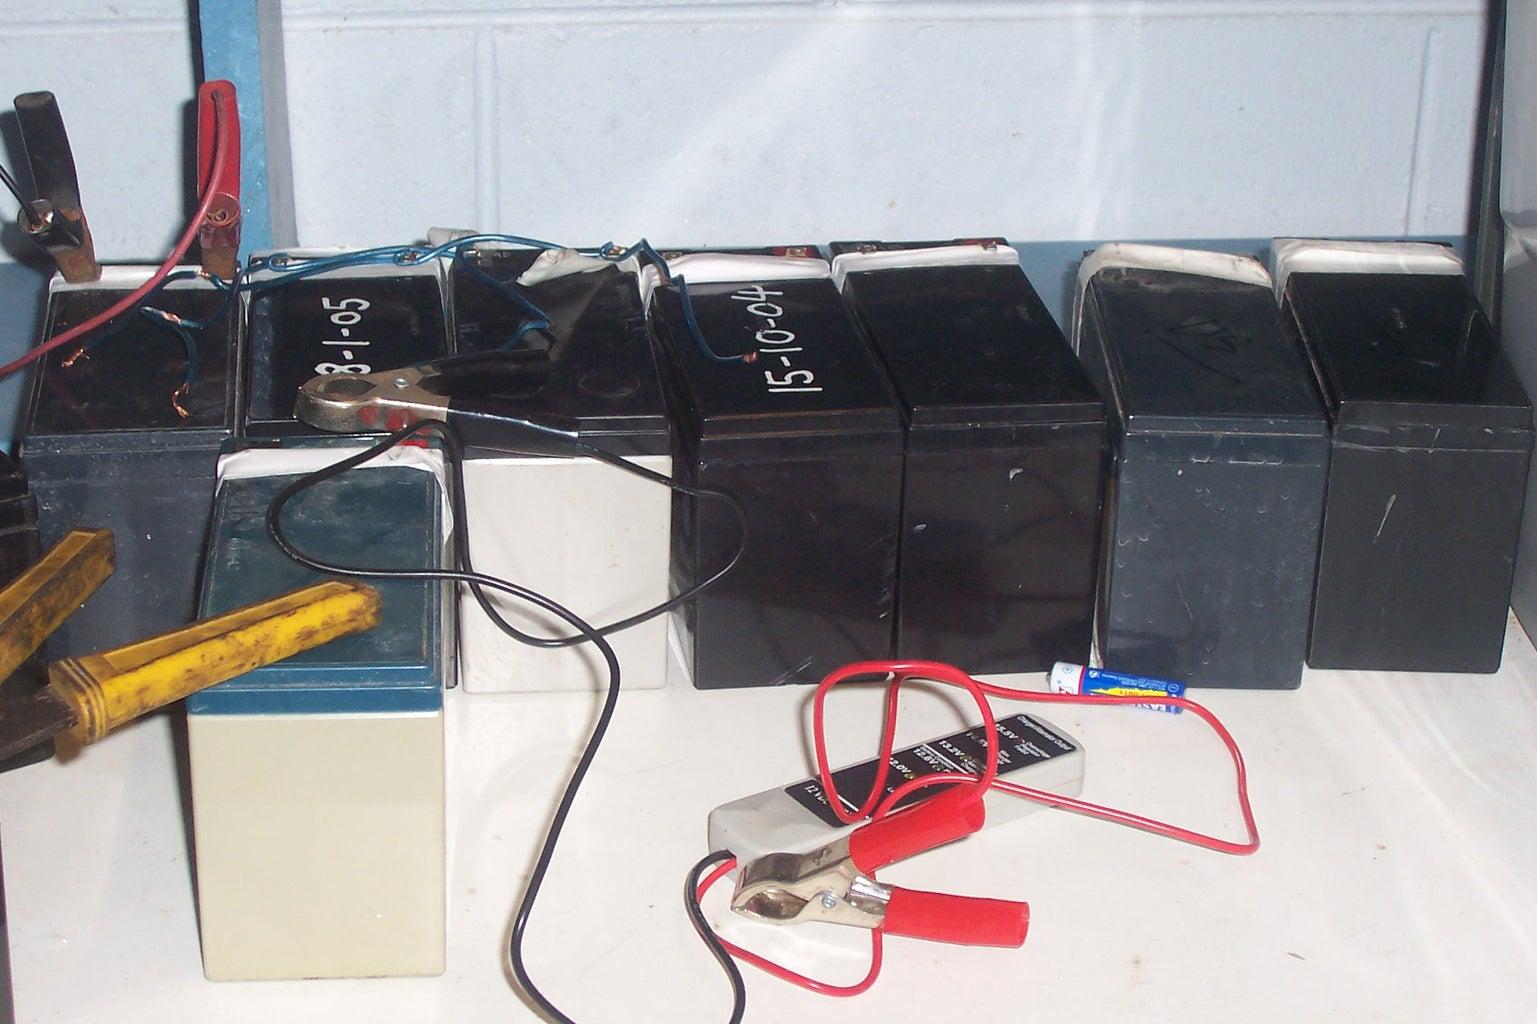 Refilling SLA's (Sealed Lead Acid Battery), Like Refilling a Car Battery